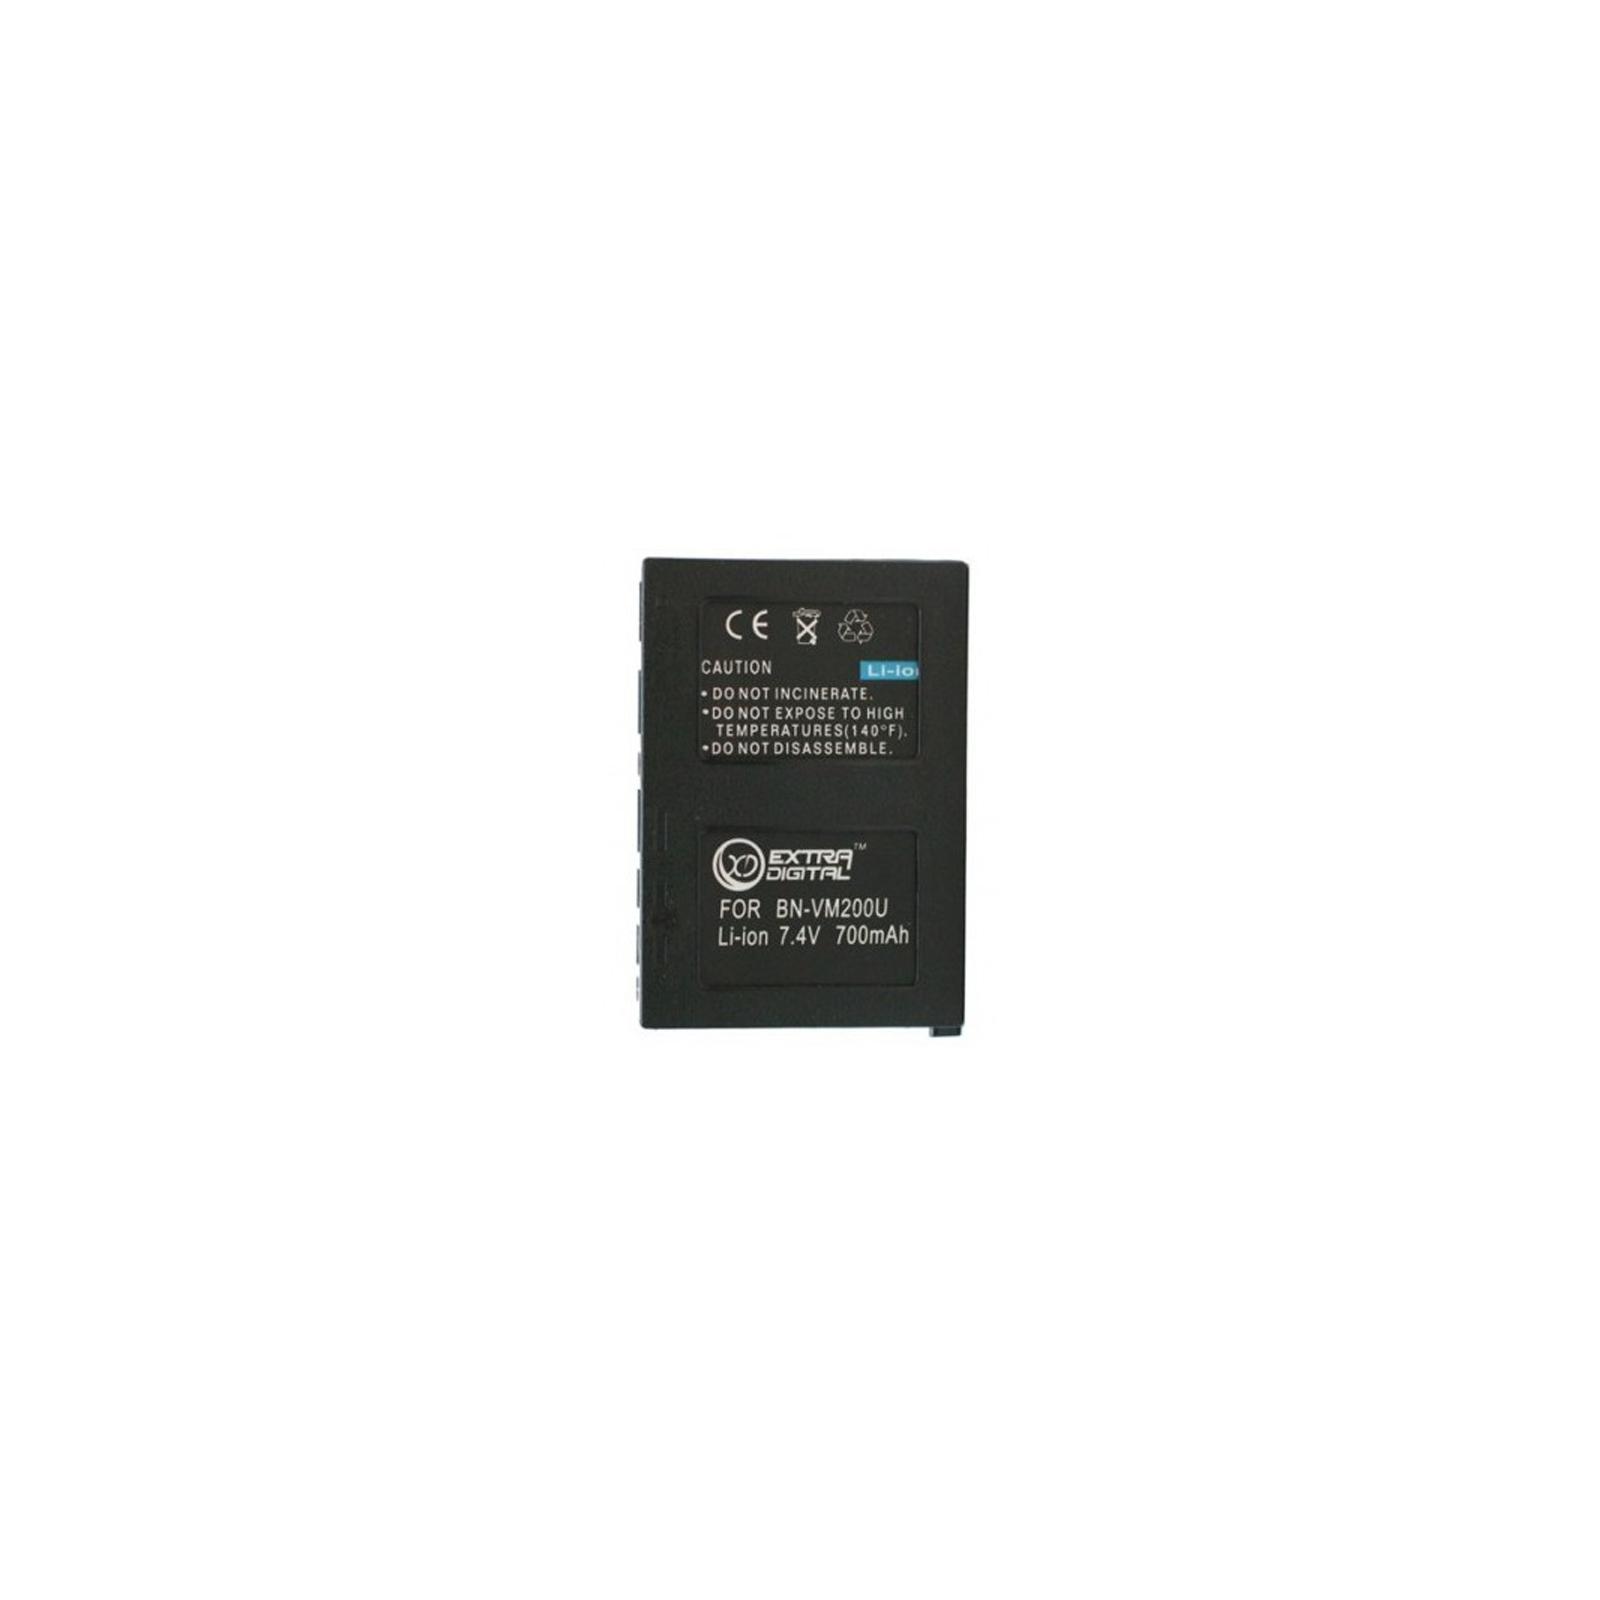 Аккумулятор к фото/видео EXTRADIGITAL JVC BN-VM200U (DV00DV1327)